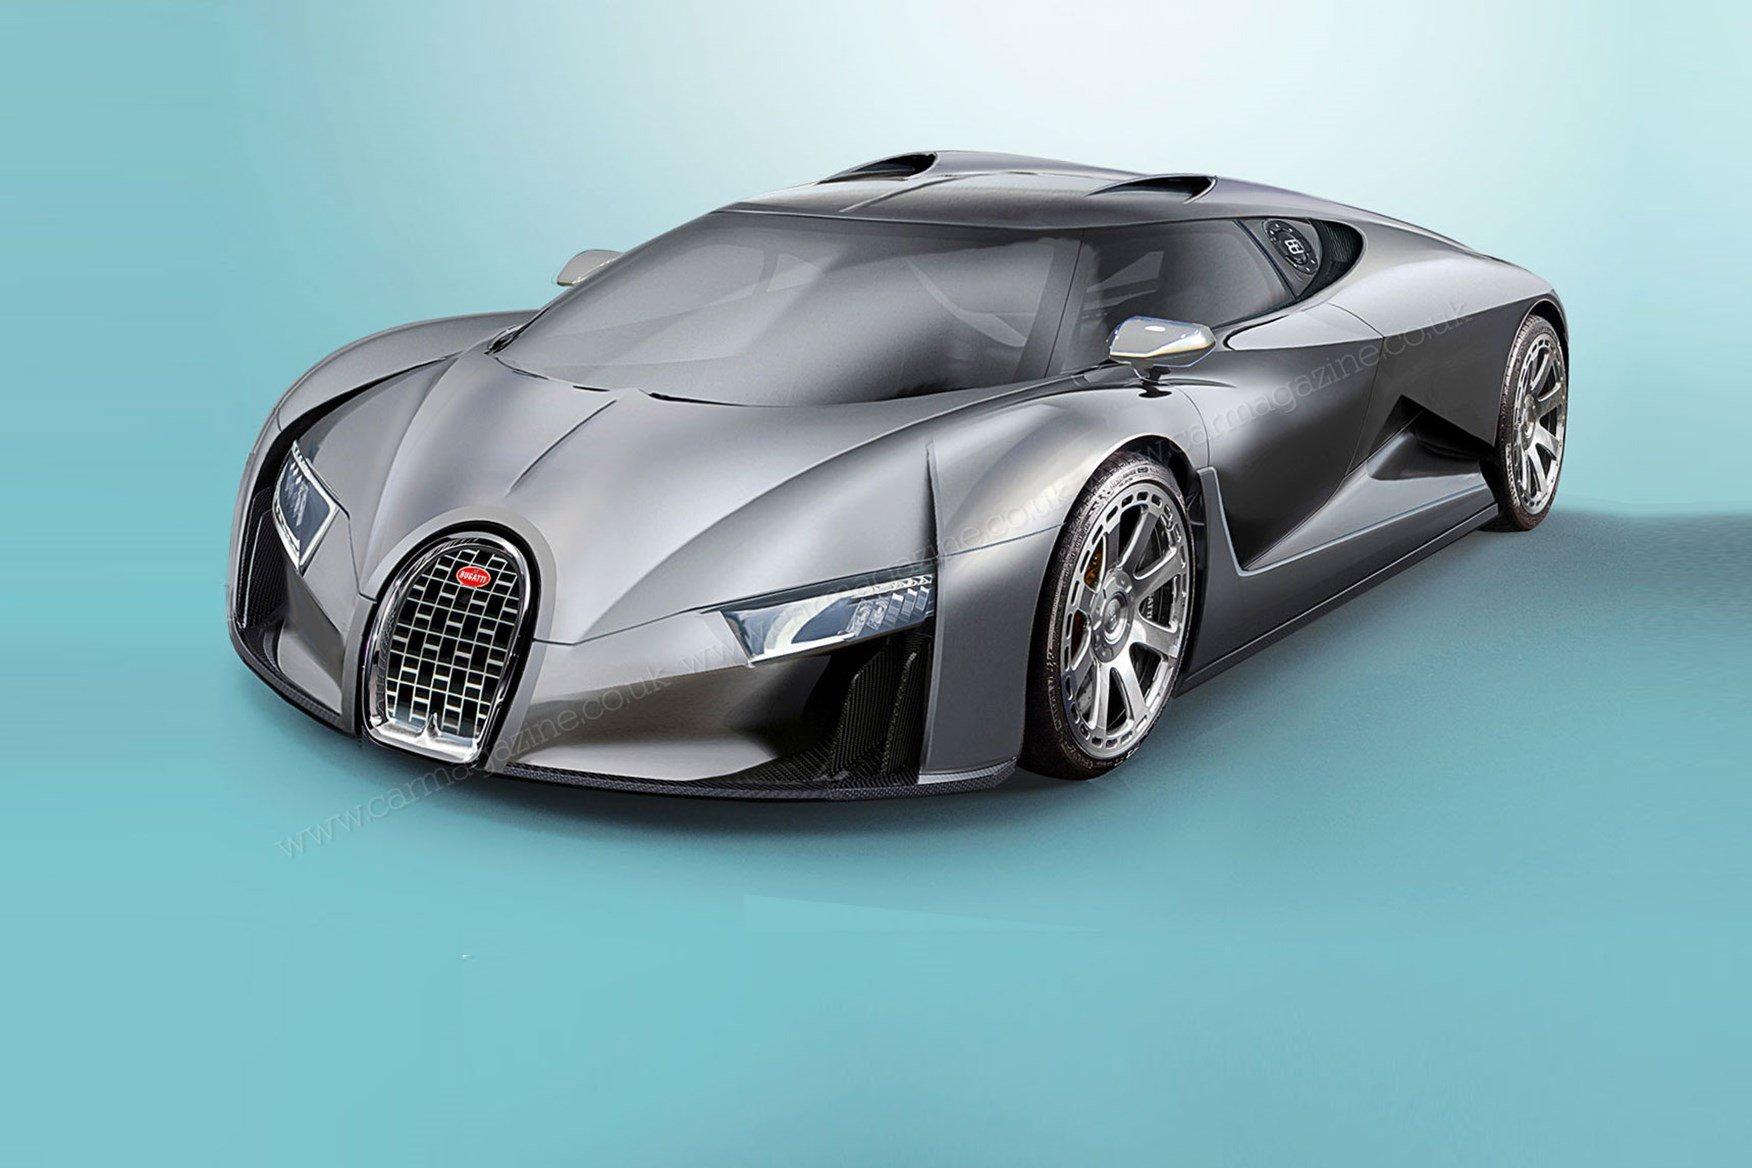 Bugatti Chiron Supercar Veyron Wallpaper